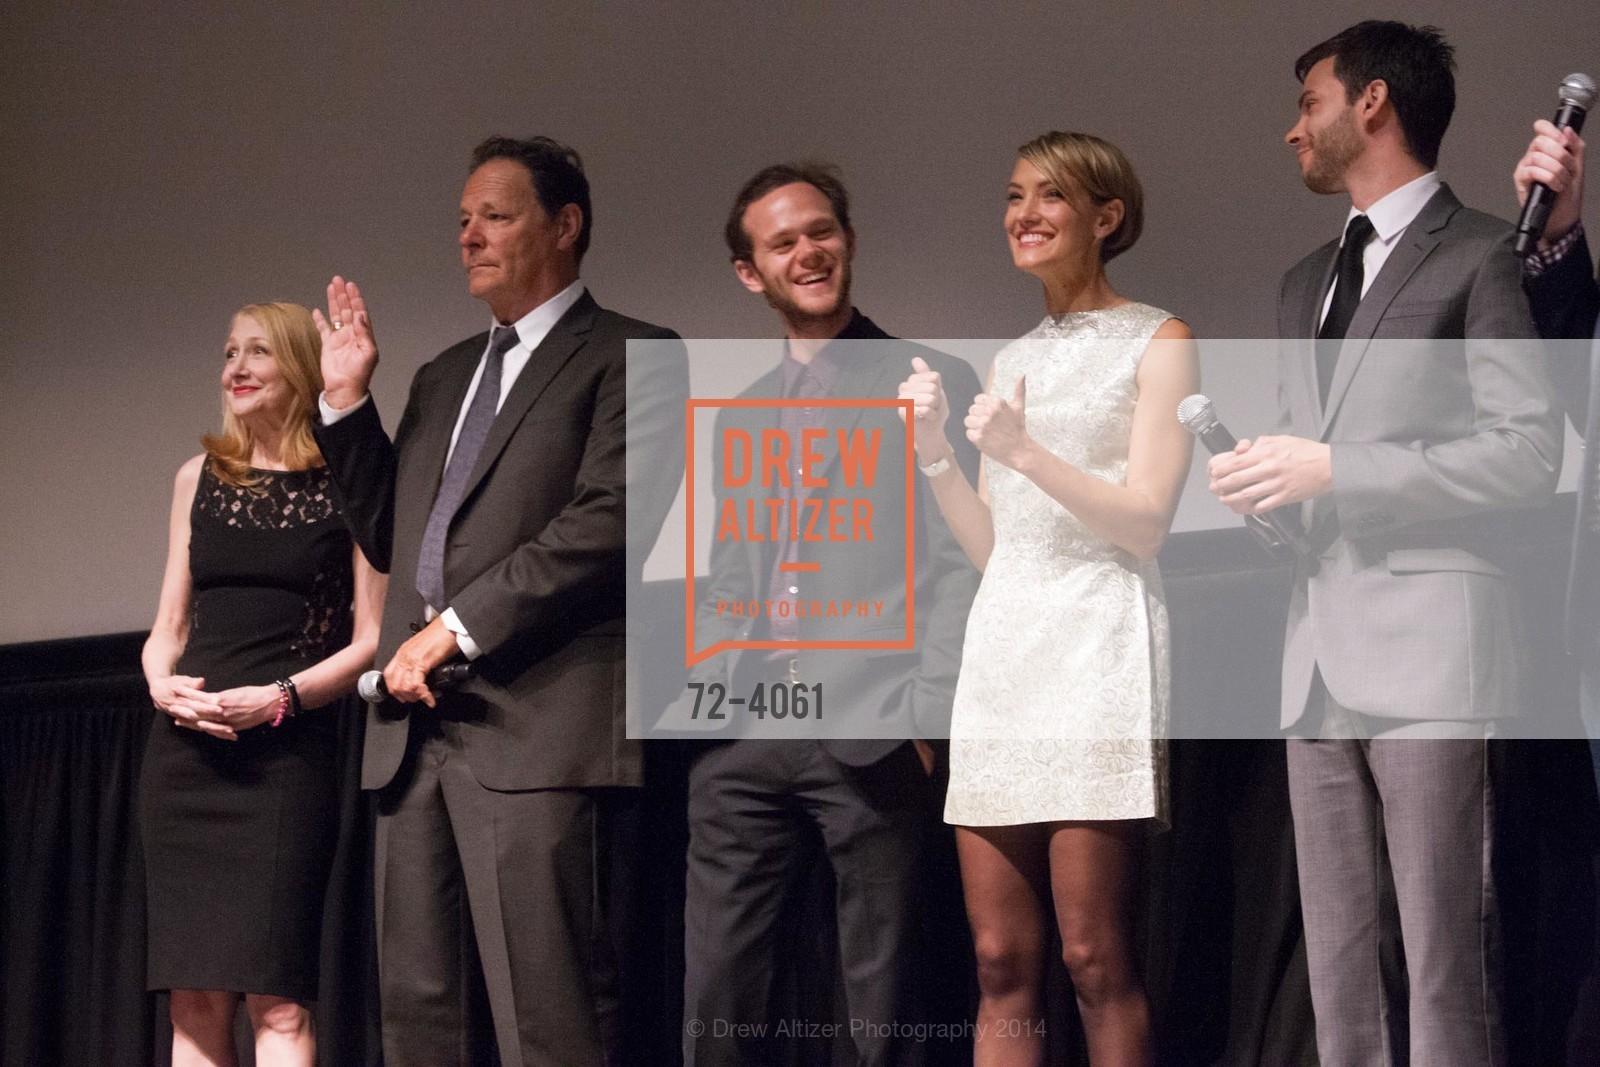 Patricia Clarkson, Chris Mulkey, Joseph Cross, Alexia Rasmussen, Devon Graye, Photo #72-4061